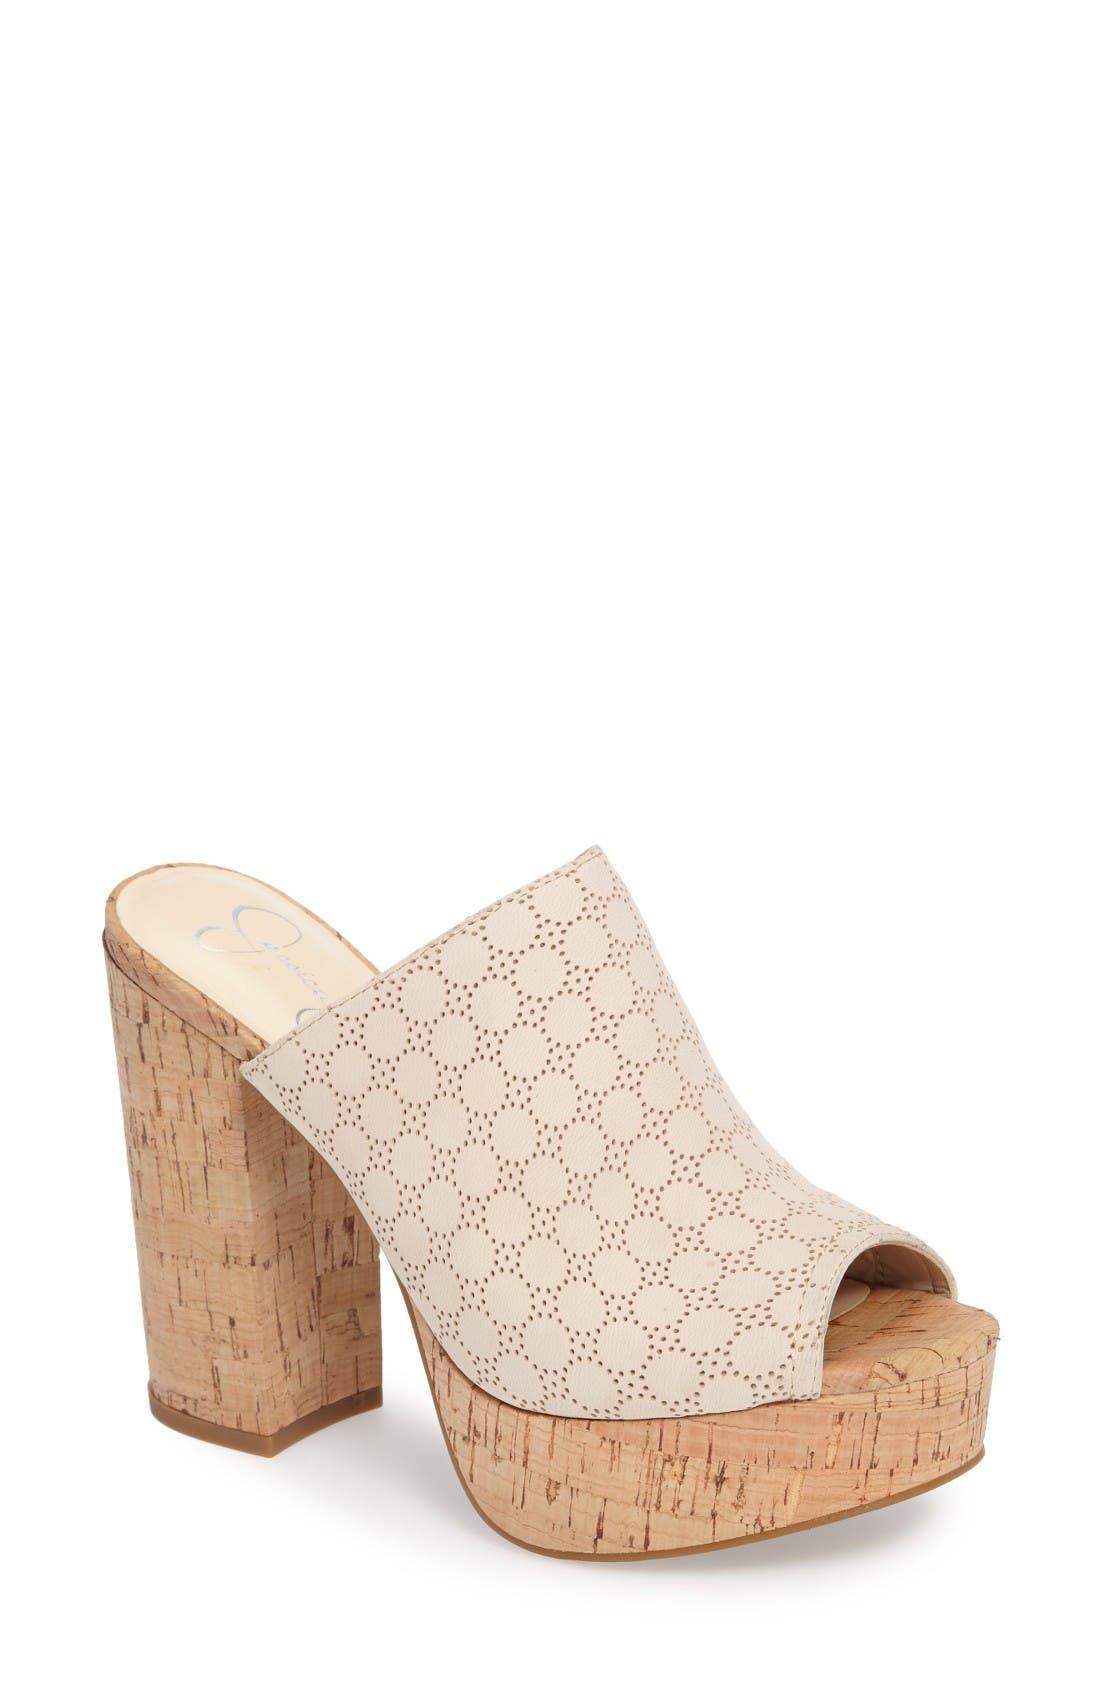 Jessica Simpson Giavanna Open Toe Platform Slide (Women)